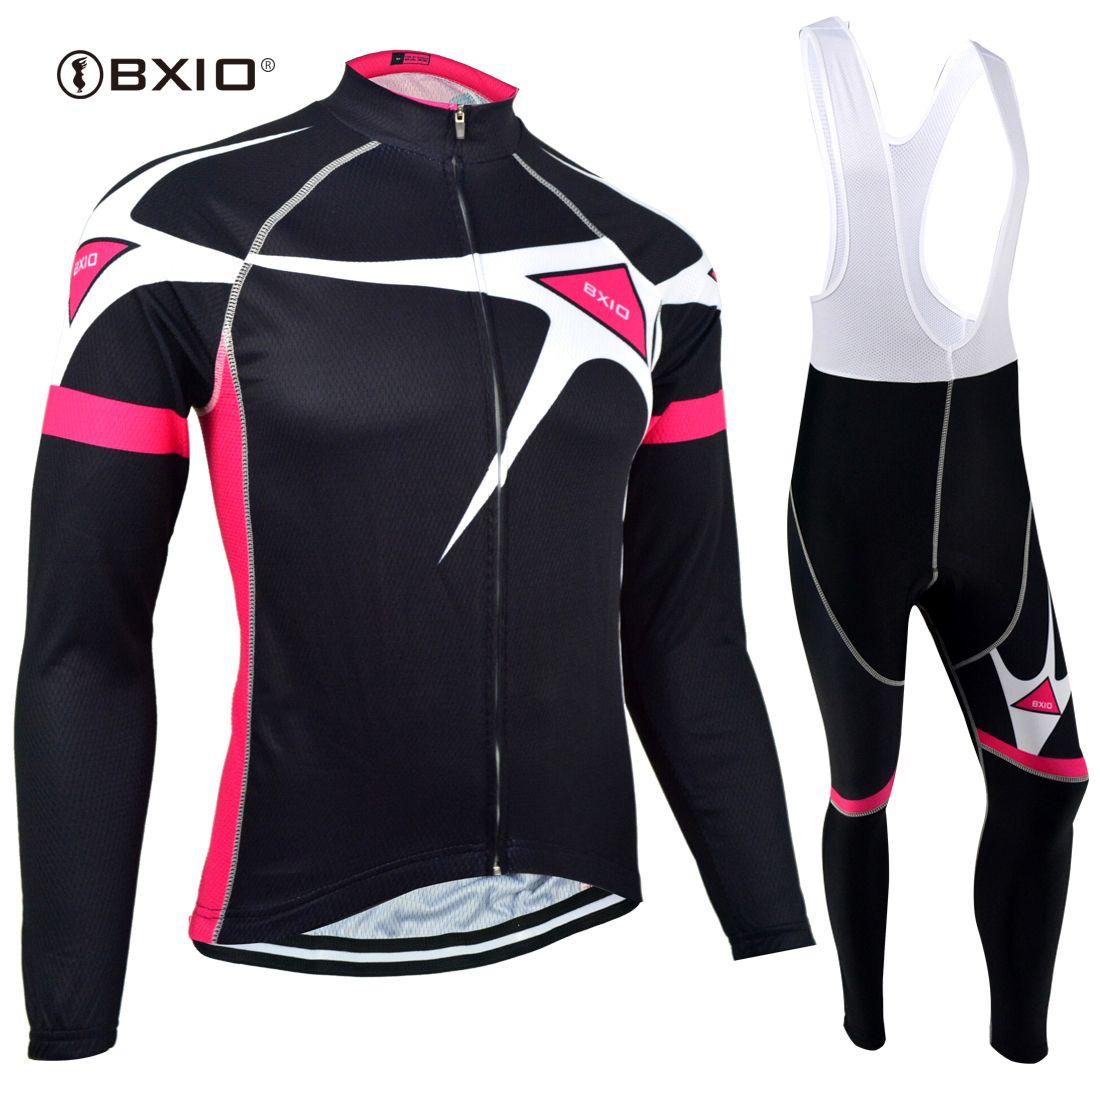 BXIO Women Cycling Clothing Black Cool Bike Jersey Winter Fleece Cycling  Clothing Gel Pad 3 Rear Pockets Pro Team Bike Taem BX 129 Cycling Jersey  Cycling ... 1c390ad4d